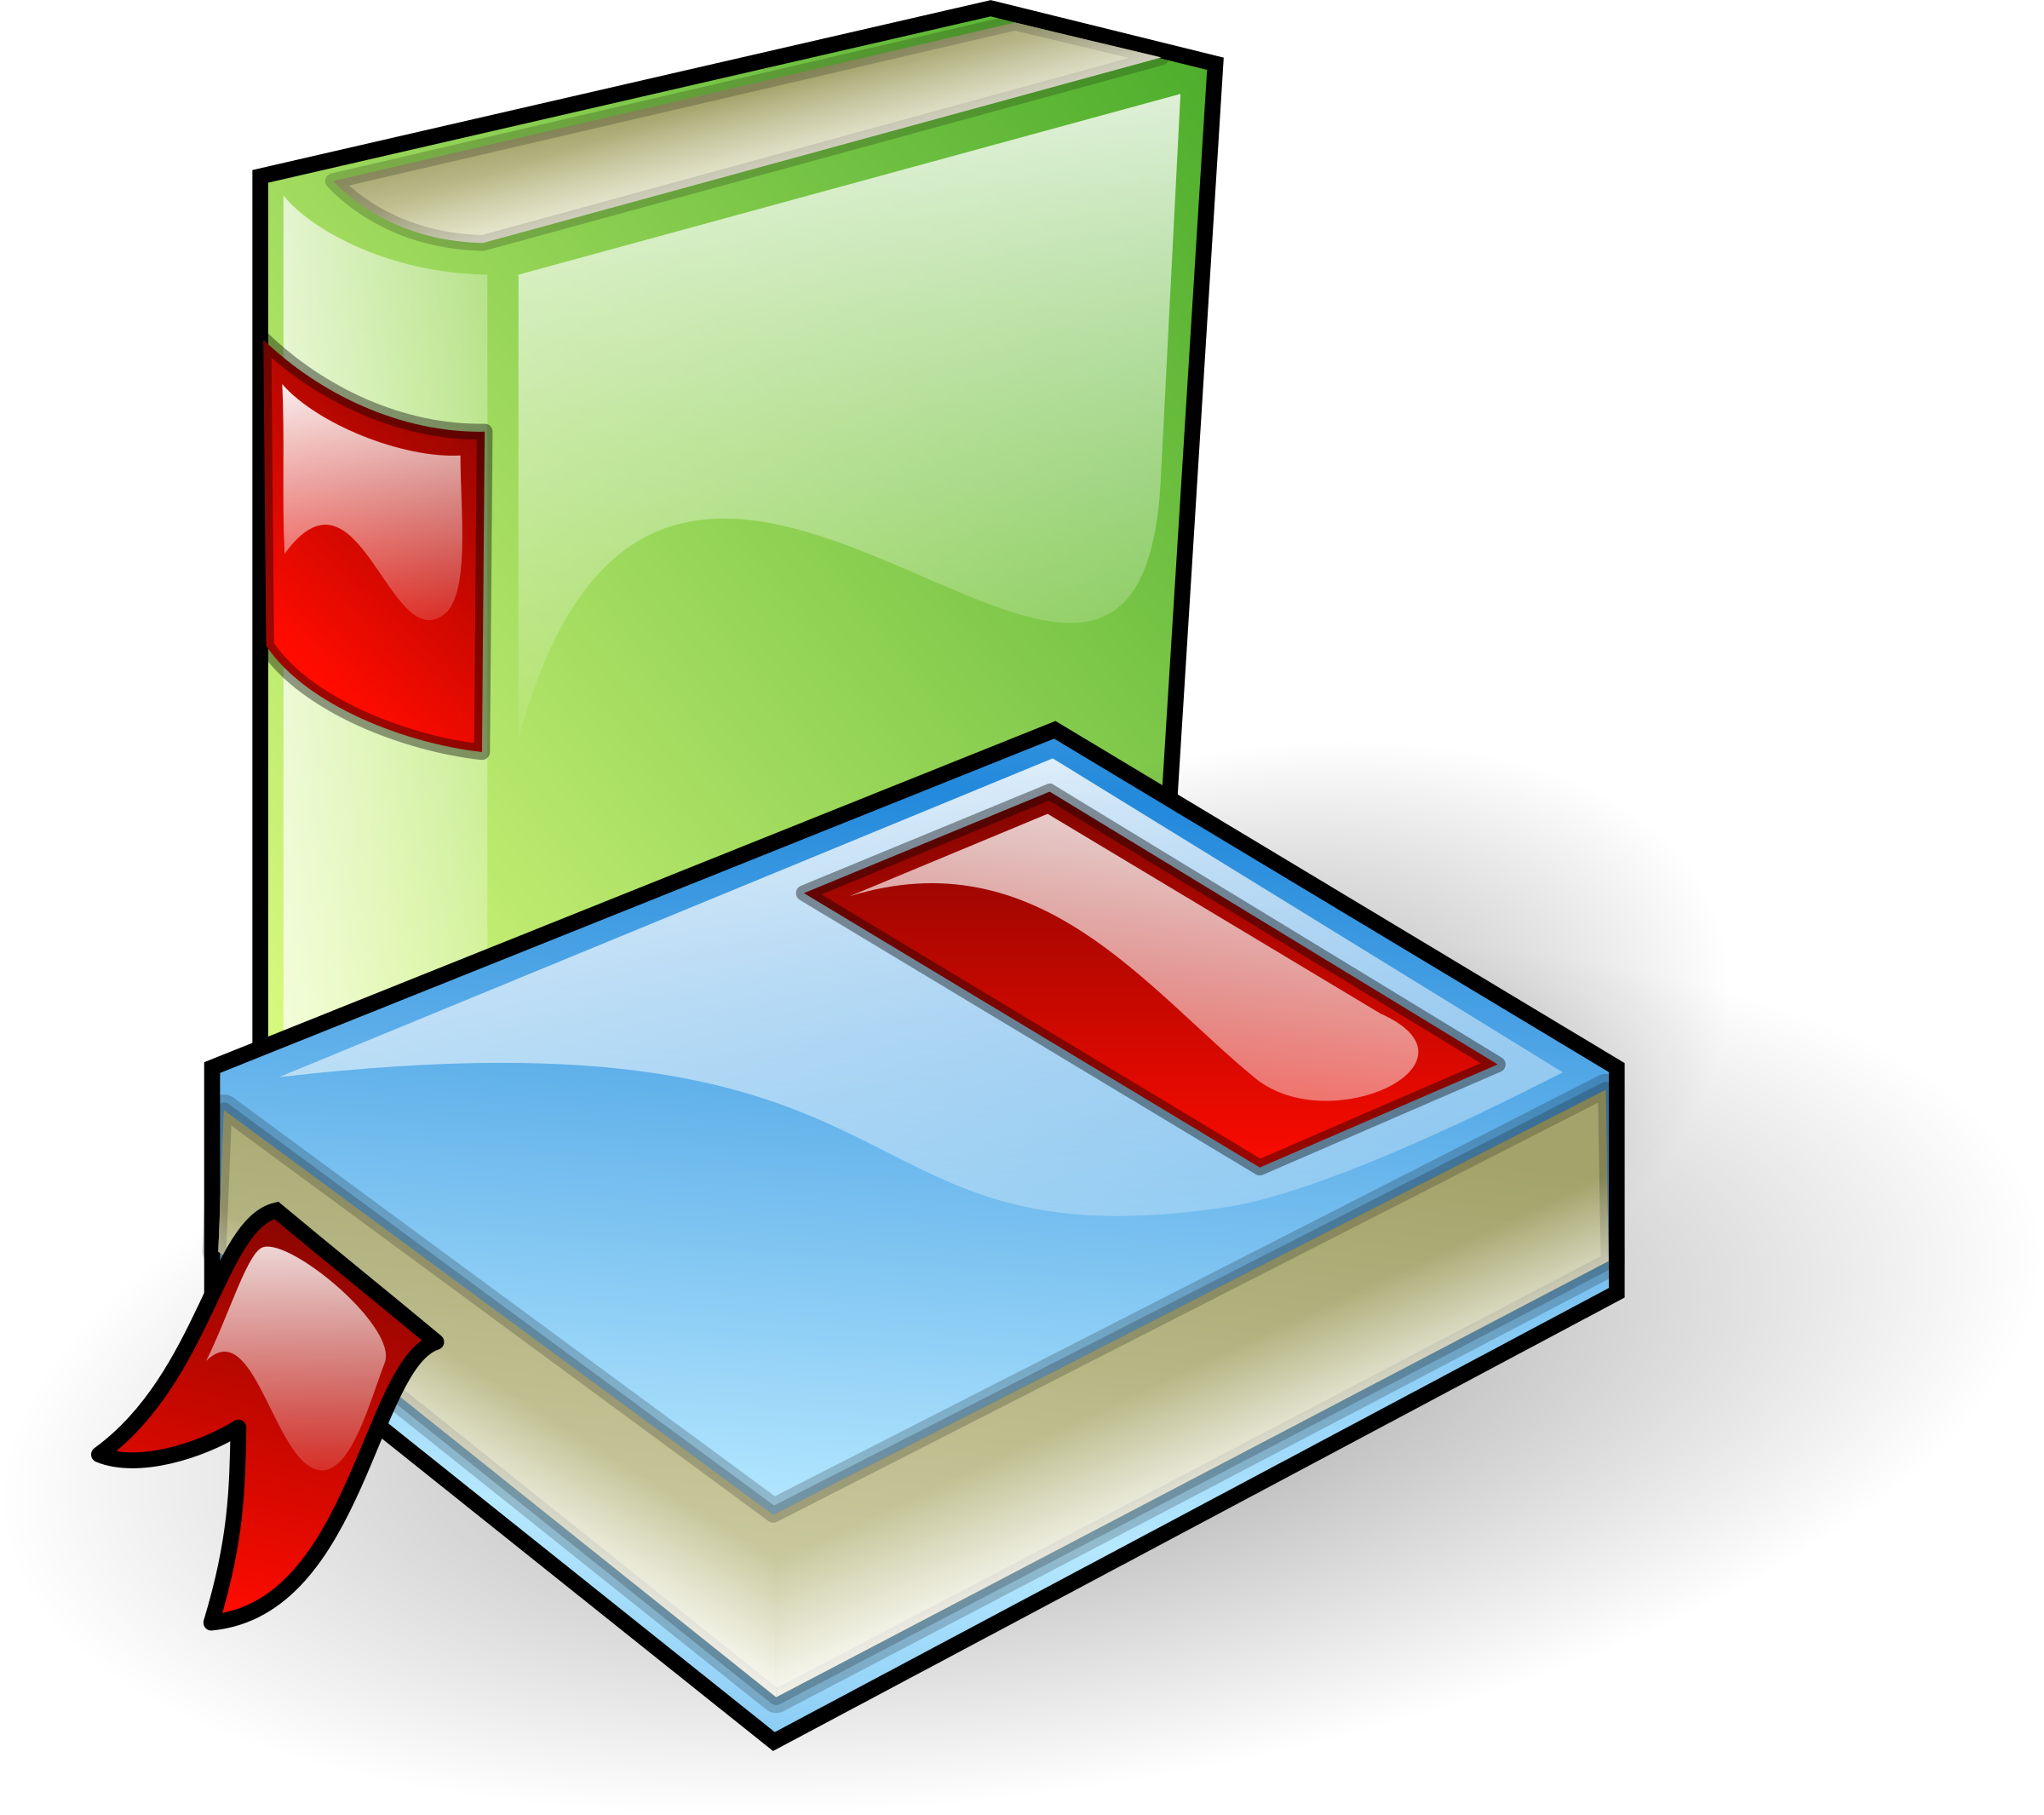 Clipart book pdf, Clipart book pdf Transparent FREE for.